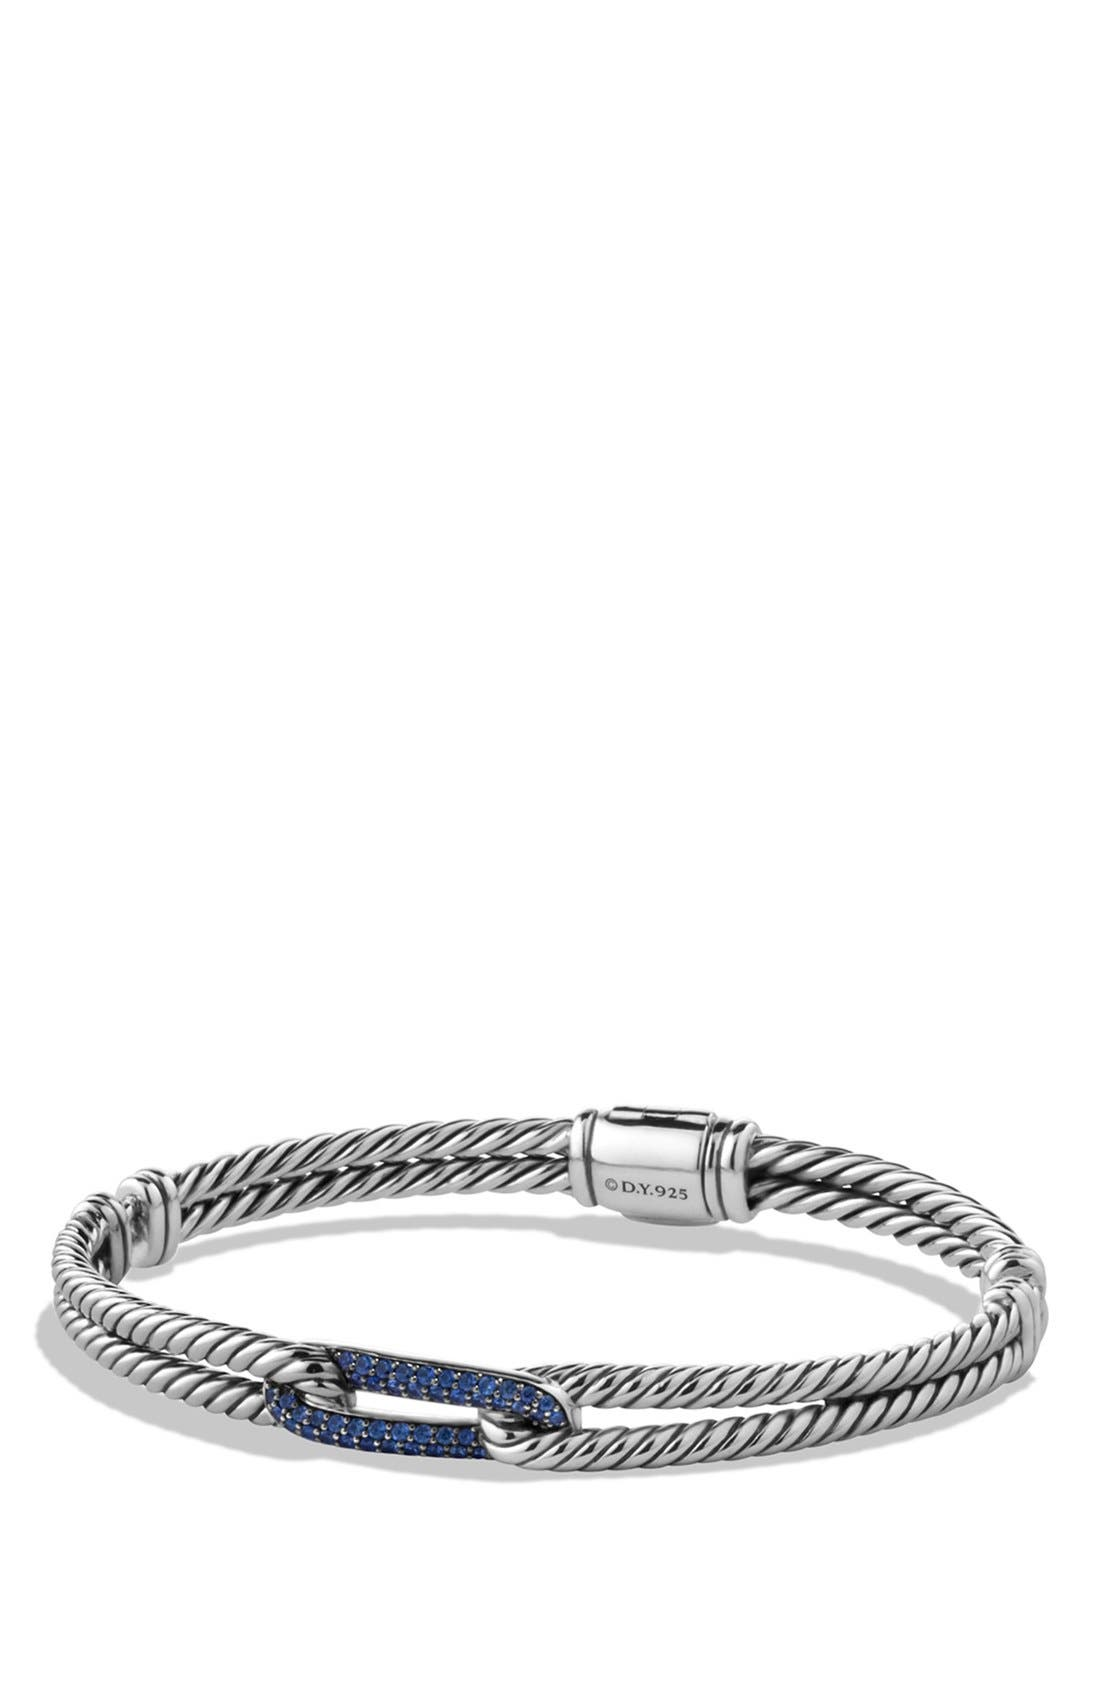 DAVID YURMAN,                             'Labyrinth' Petite Pavé Single-Loop Bracelet with Sapphires,                             Main thumbnail 1, color,                             BLUE SAPPHIRE